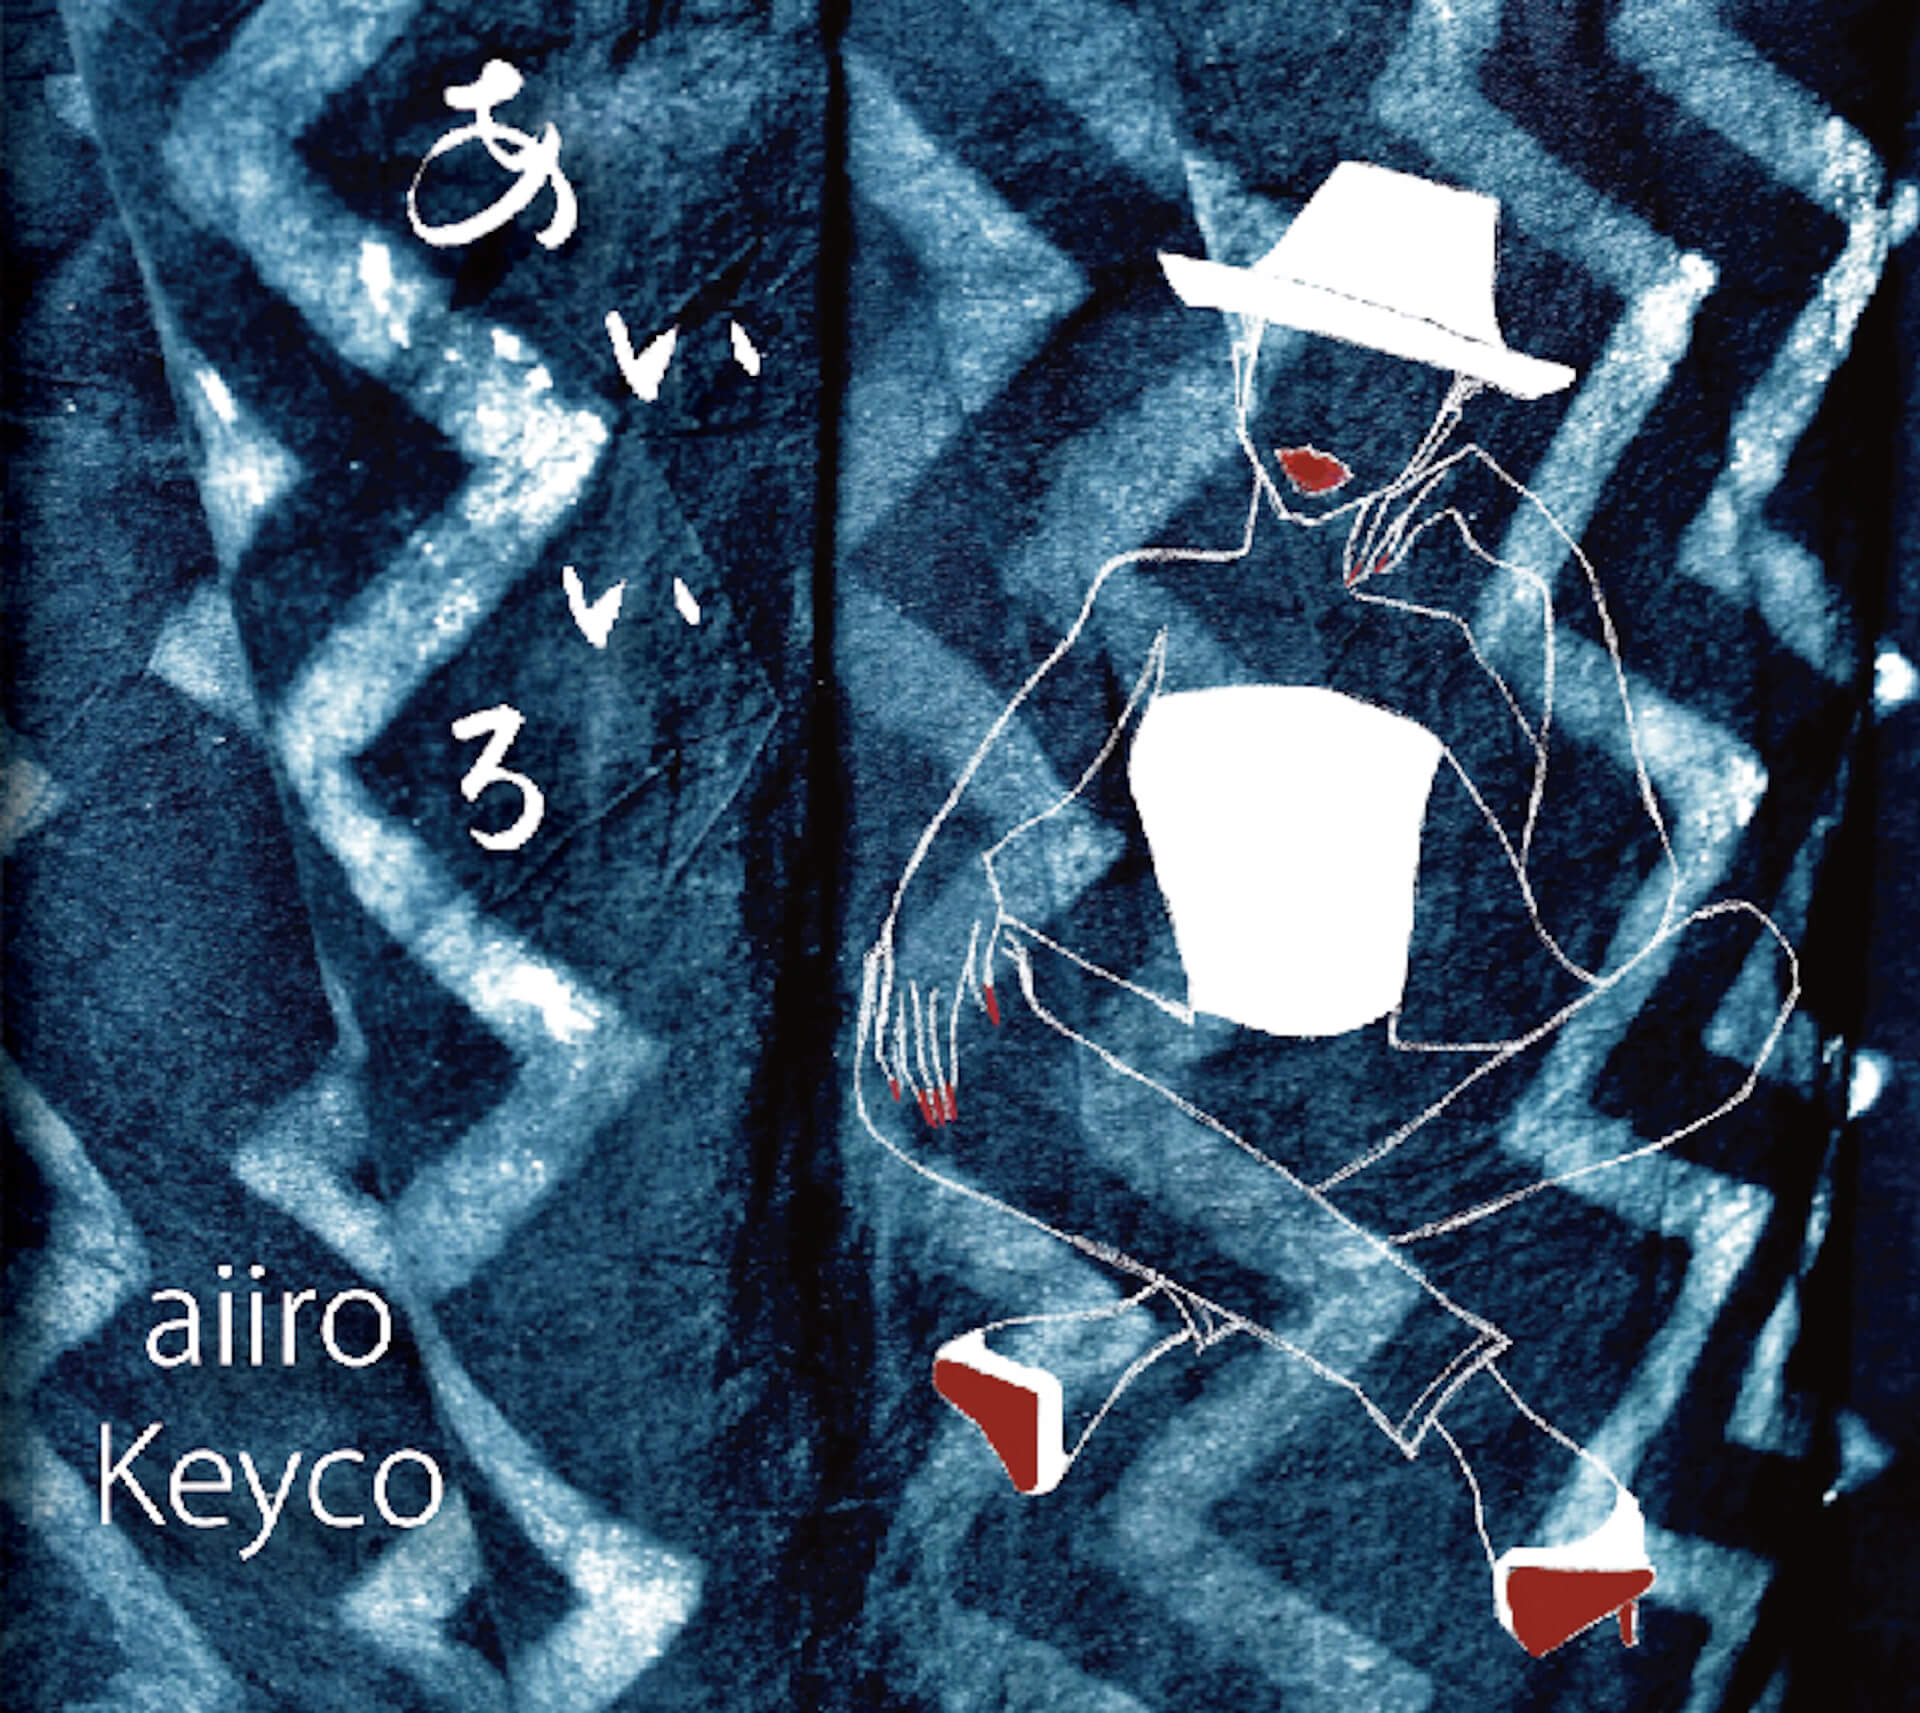 SSW・Keycoが20周年を記念したニューアルバムをリリース! PUSHIM、GagleのHUNGERら総勢40名とコラボ music210217_keyco-02